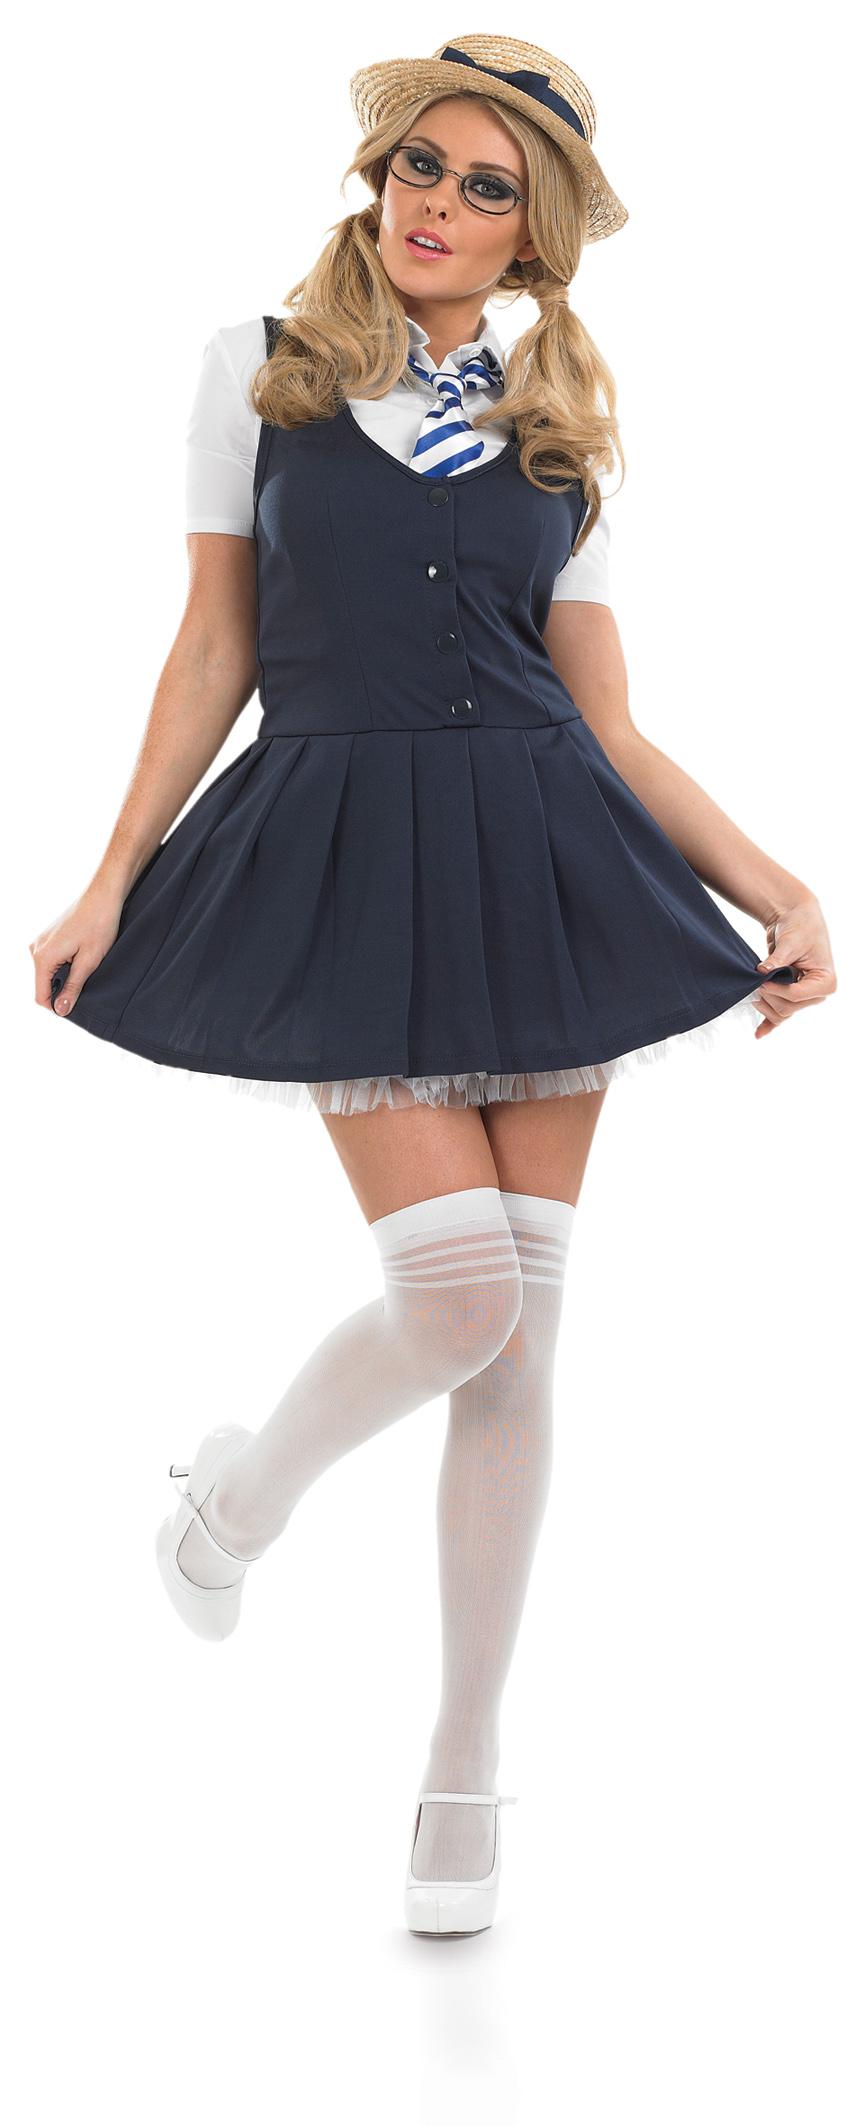 Sexy-School-Girl-Fancy-Dress-Uniform-Ladies-Costume-Adult-Outfit-Hat-UK-8-30